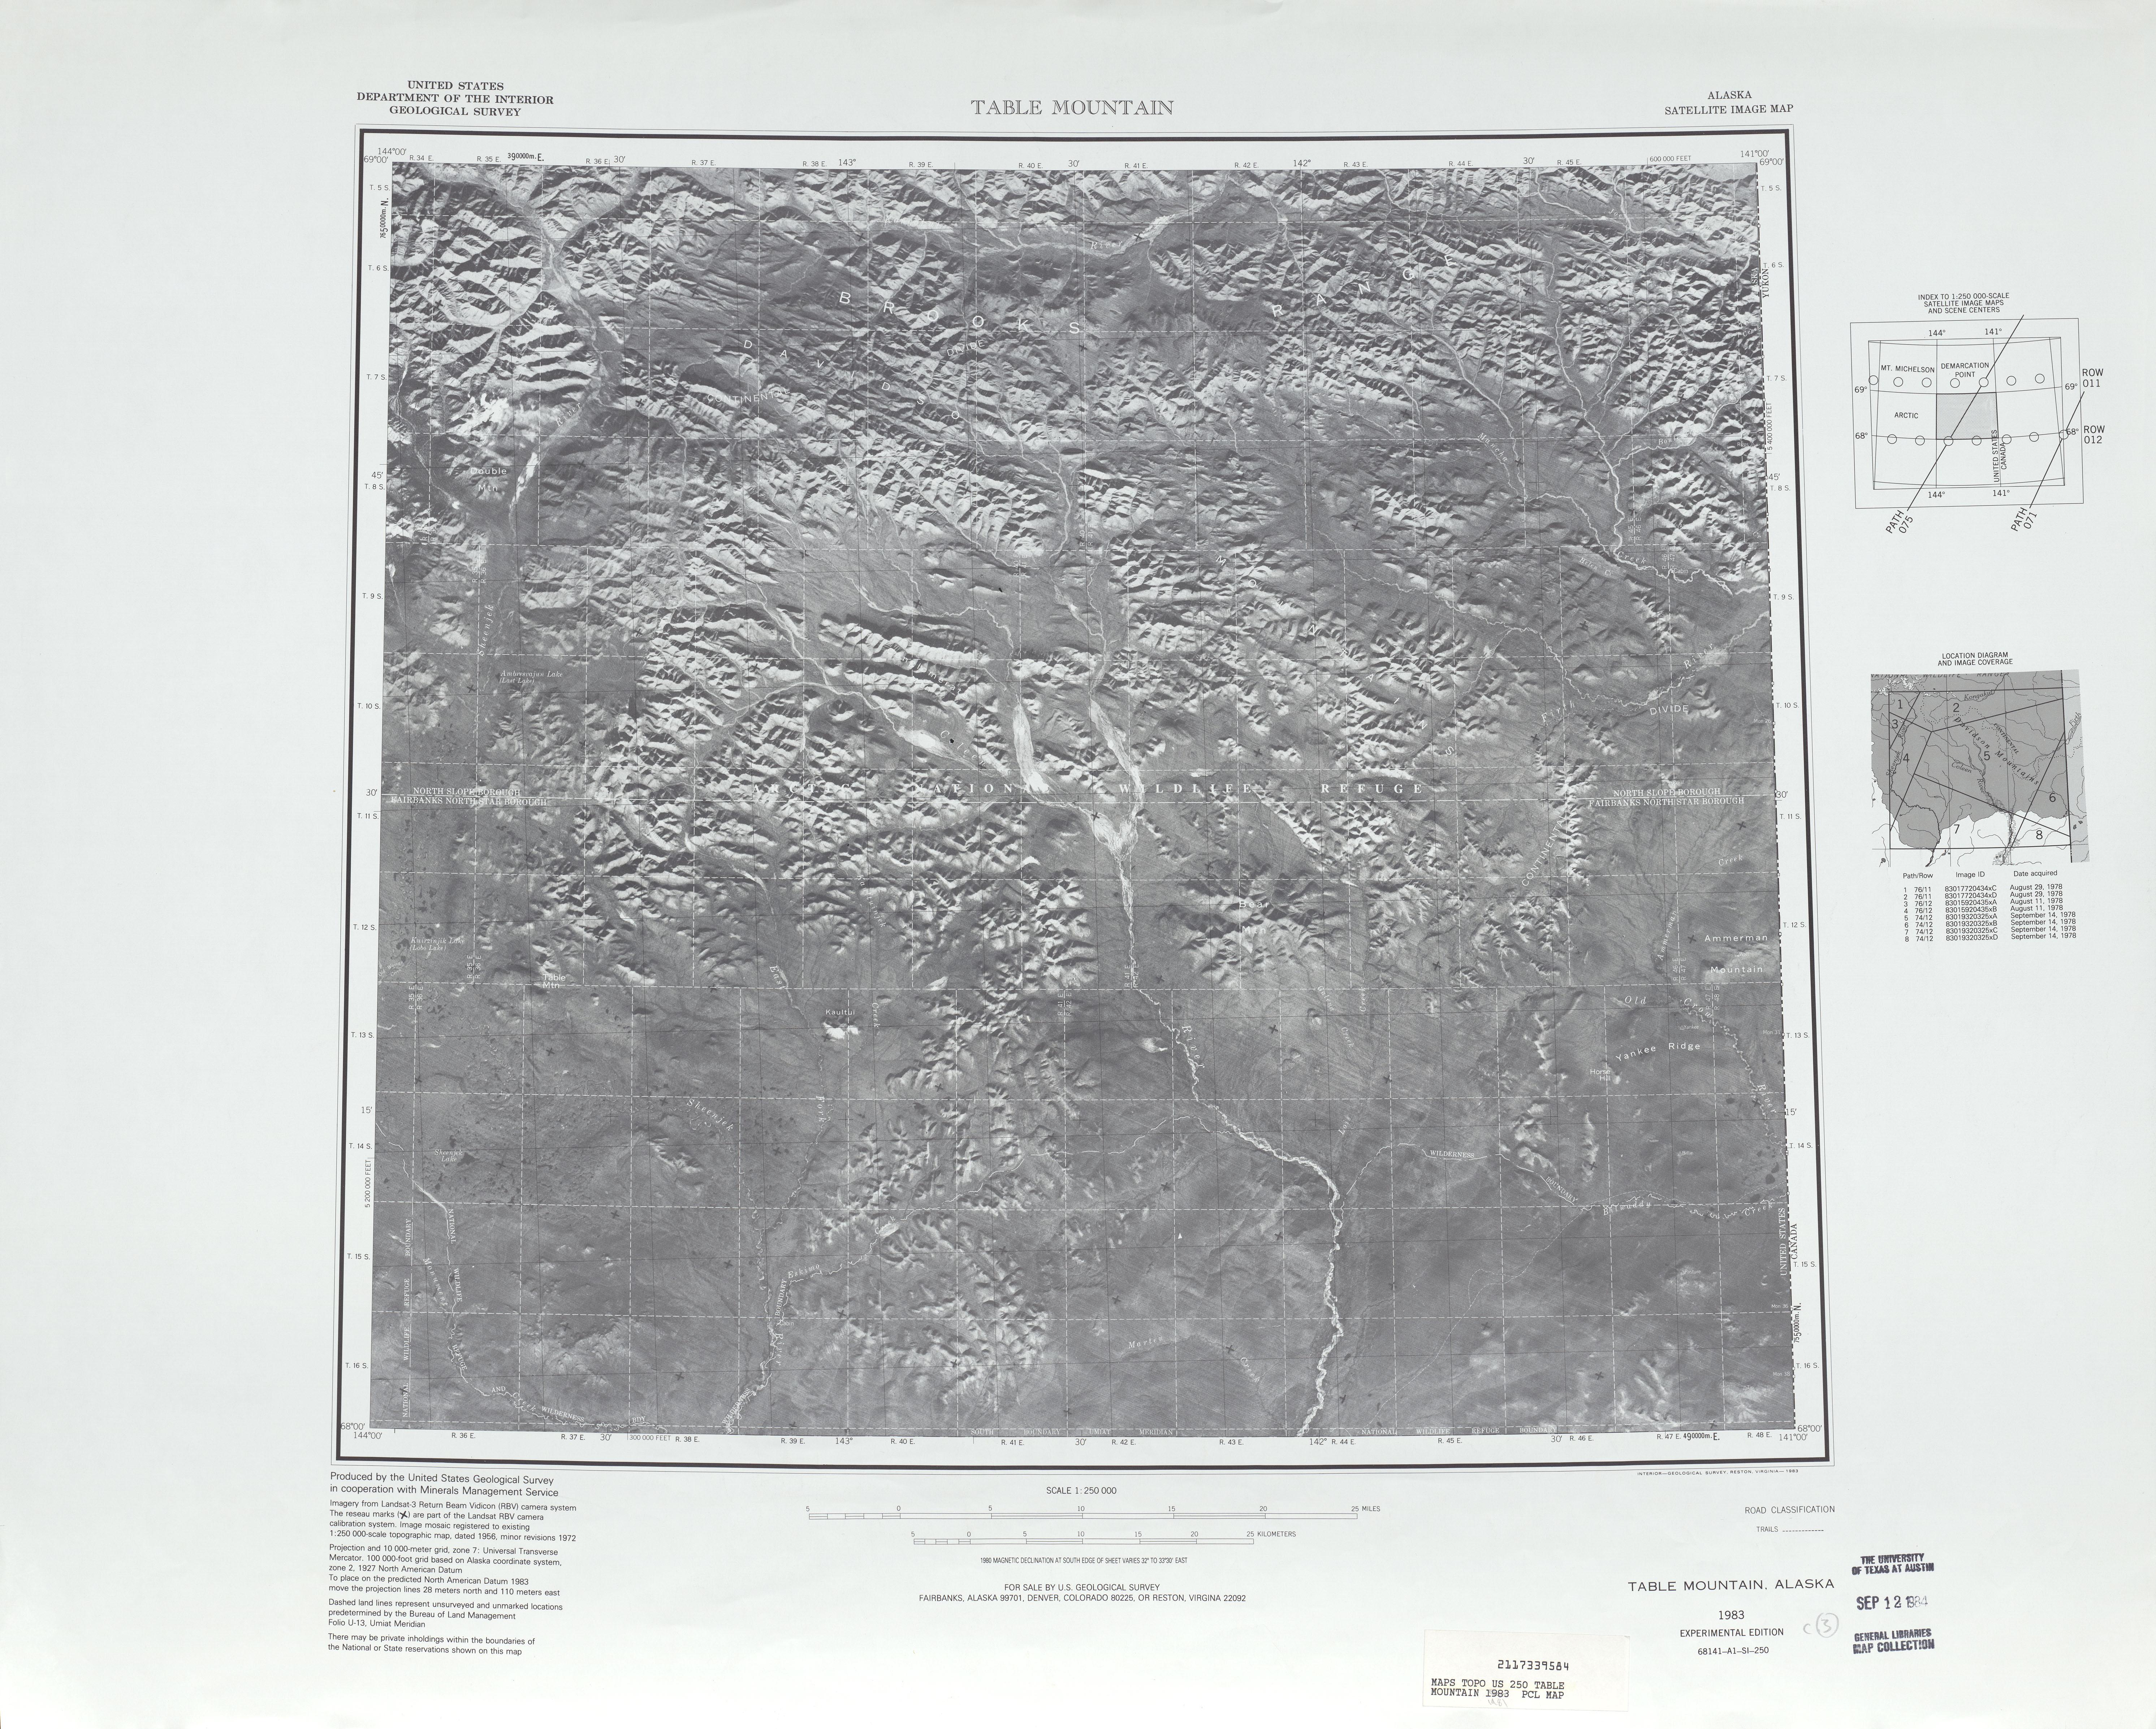 Table Mountain Satellite Image Sheet, United States